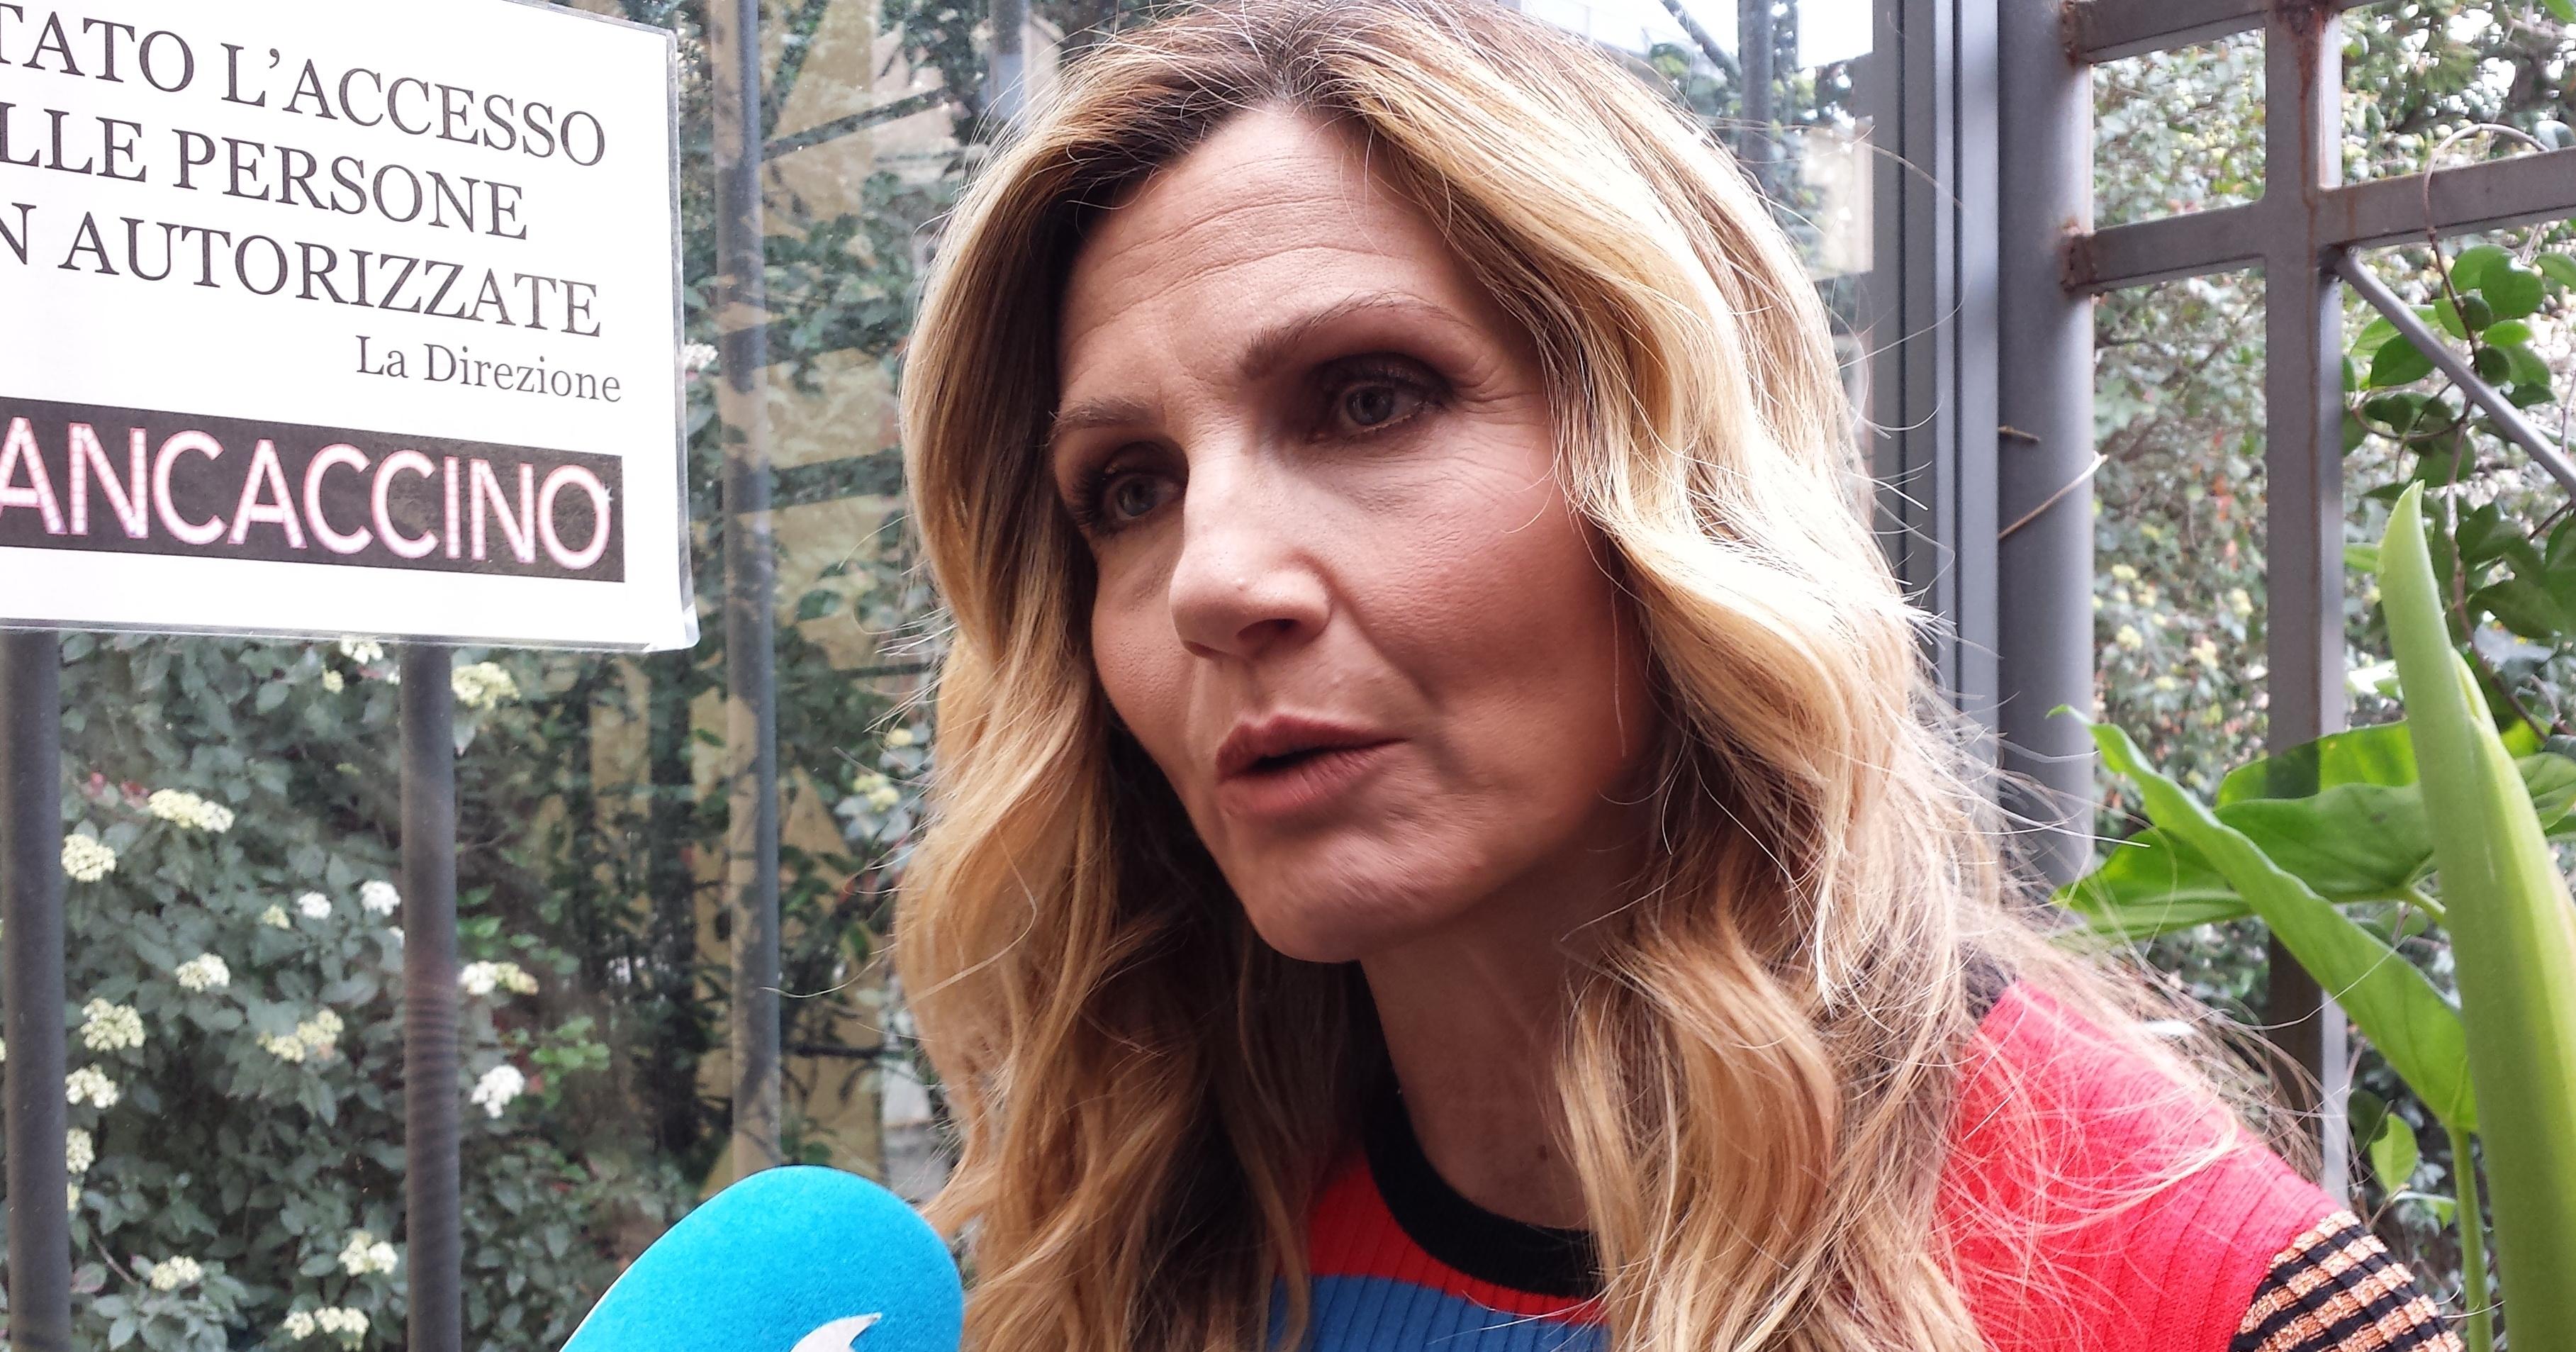 Lorella Cuccarini (foto di Ivan Zingariello)